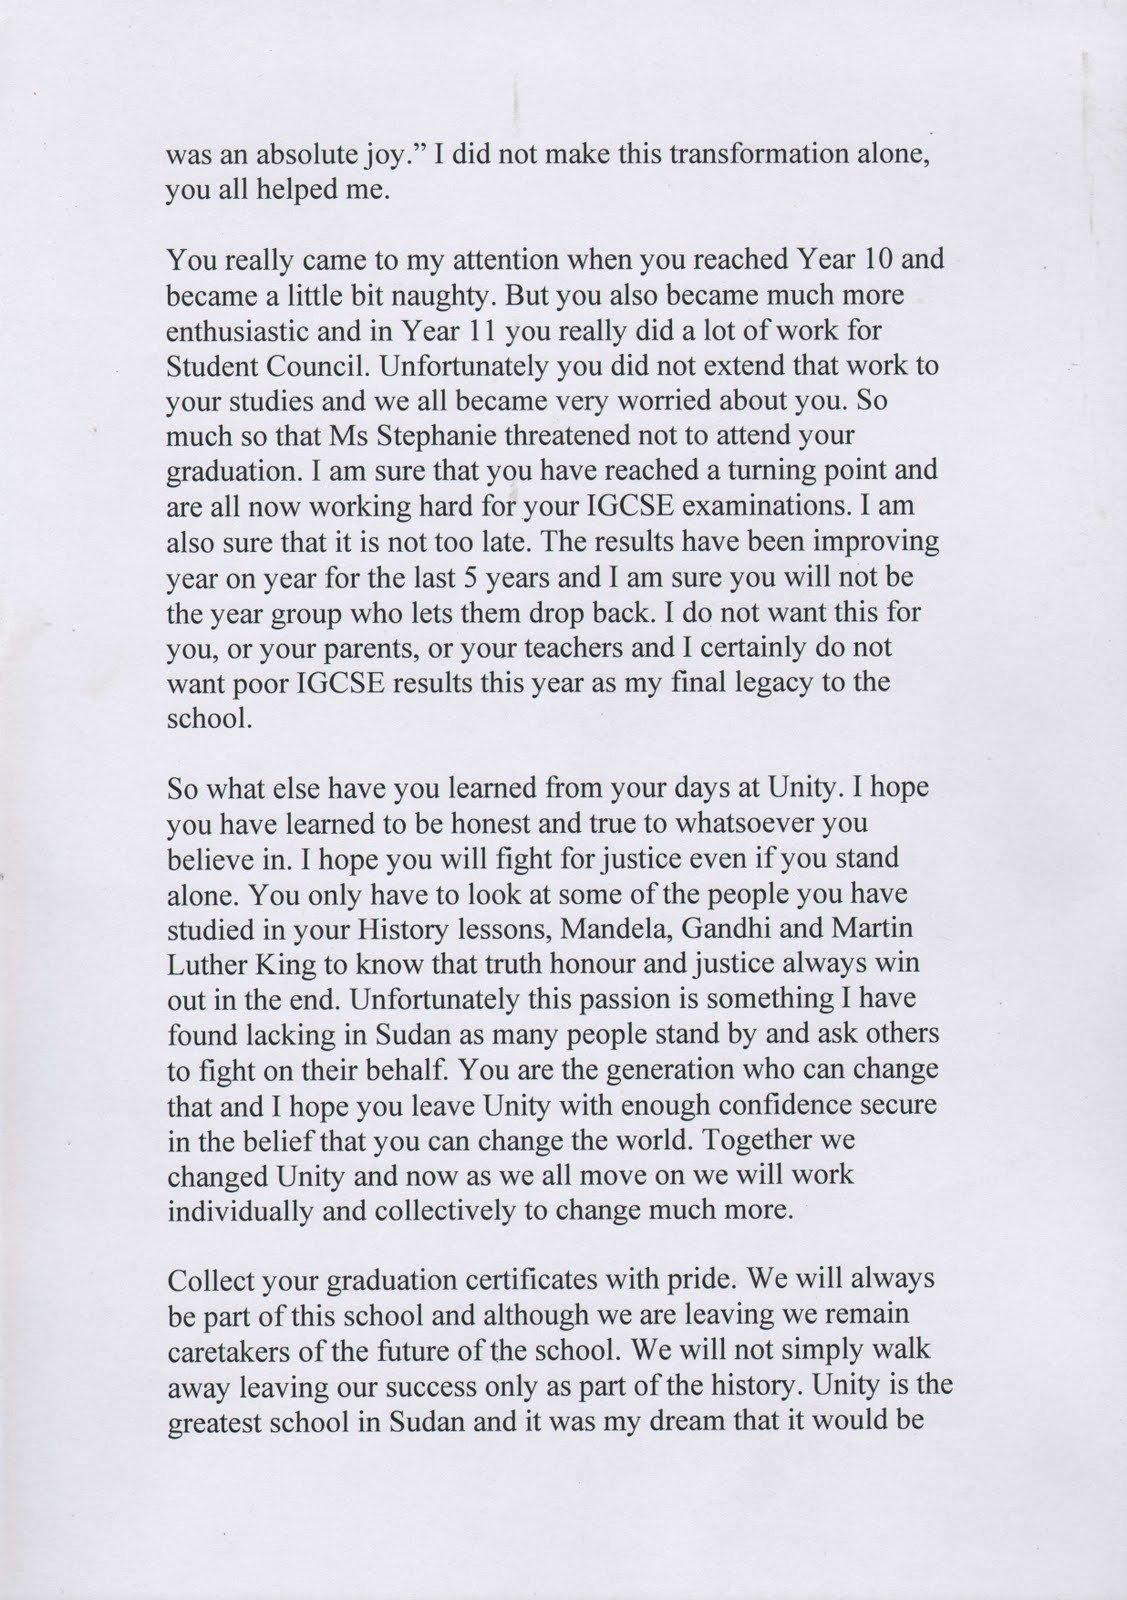 10 Stylish Middle School Graduation Speech Ideas graduation essay ideas graduation speech essay graduation speech 2021